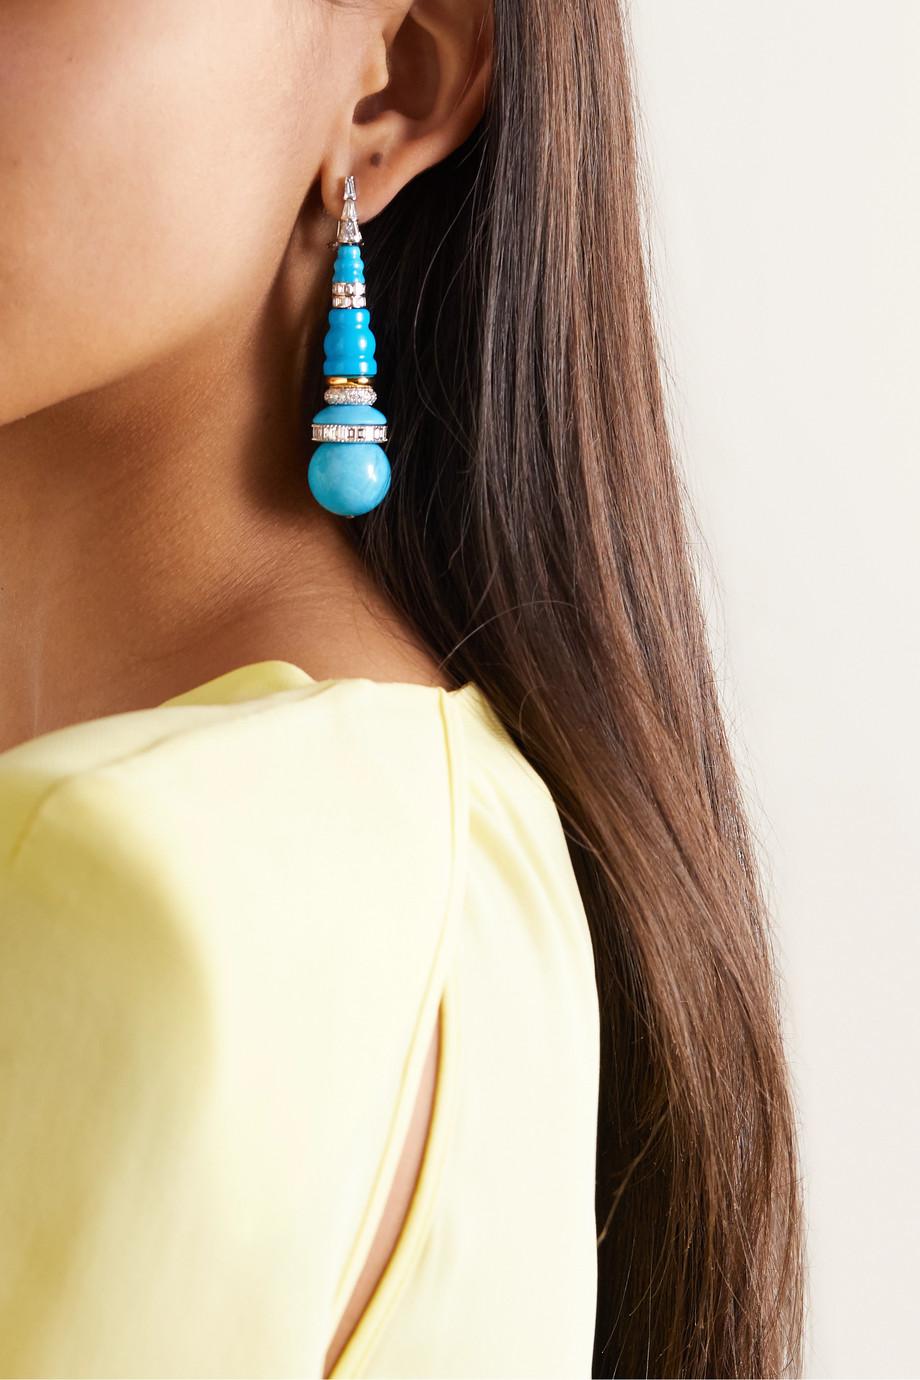 Bina Goenka 18-karat white and yellow gold, turquoise and diamond earrings